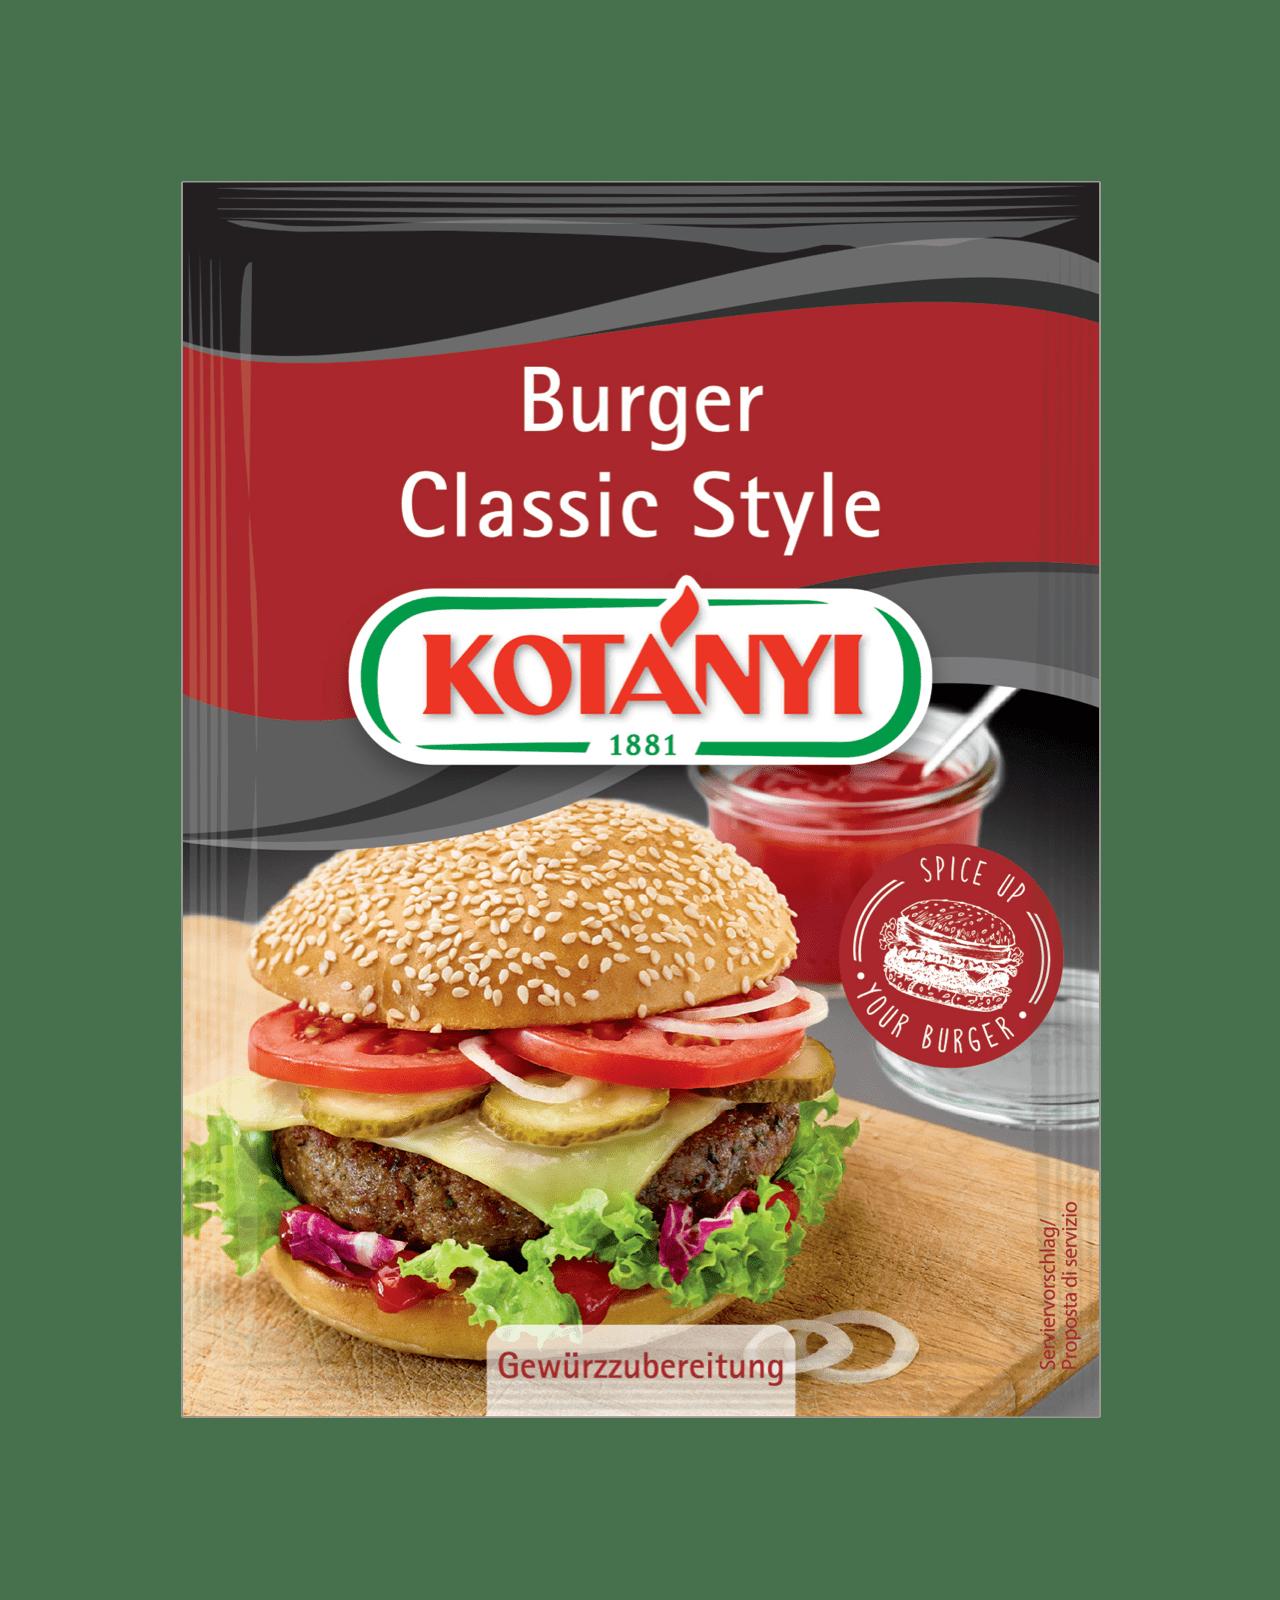 Kotányi Burger Classic Style im Brief